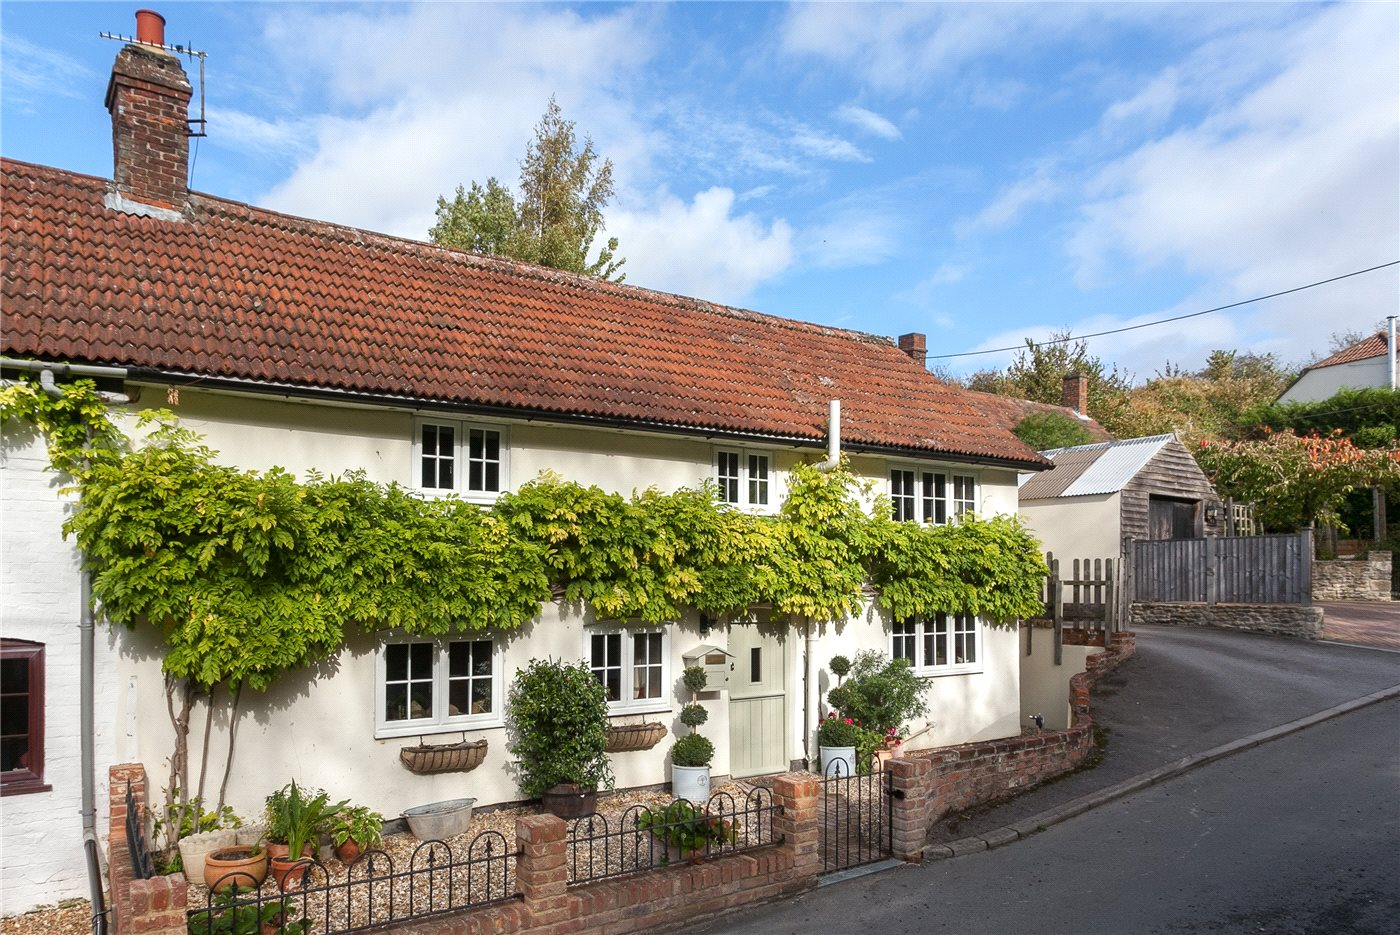 4 Bedroom Property For Sale In Salisbury Hollow Edington